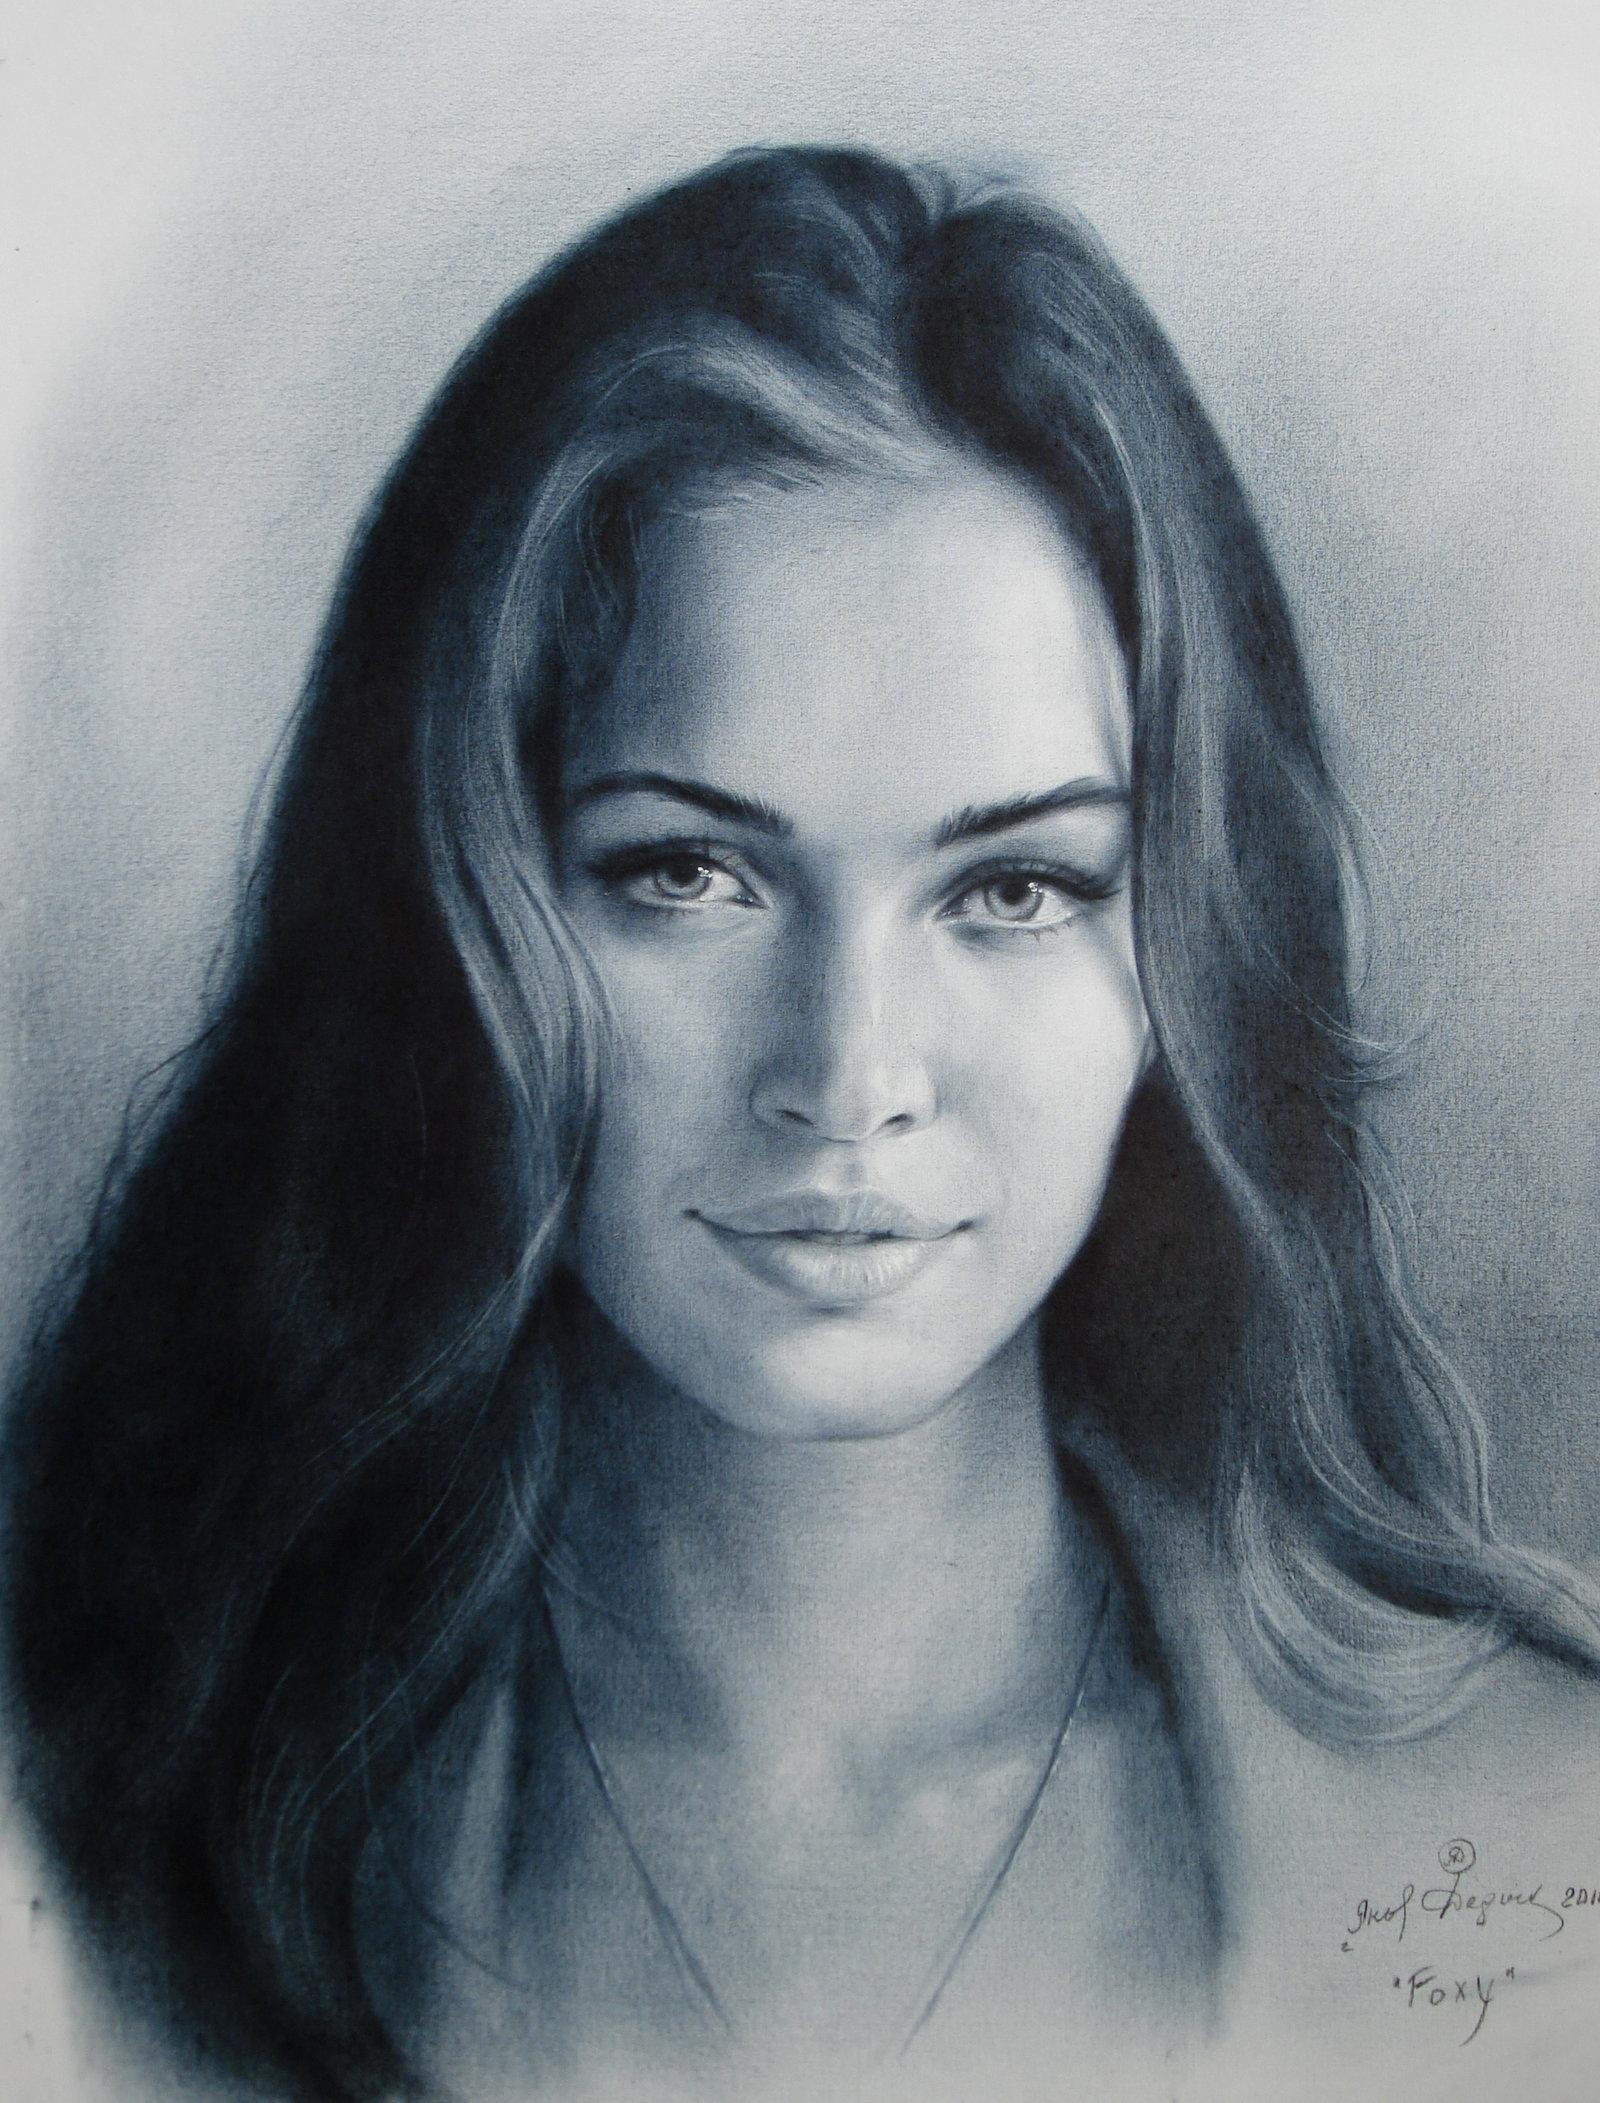 Drawn portrait megan fox Realistic Drawing Drawing Megan Megan